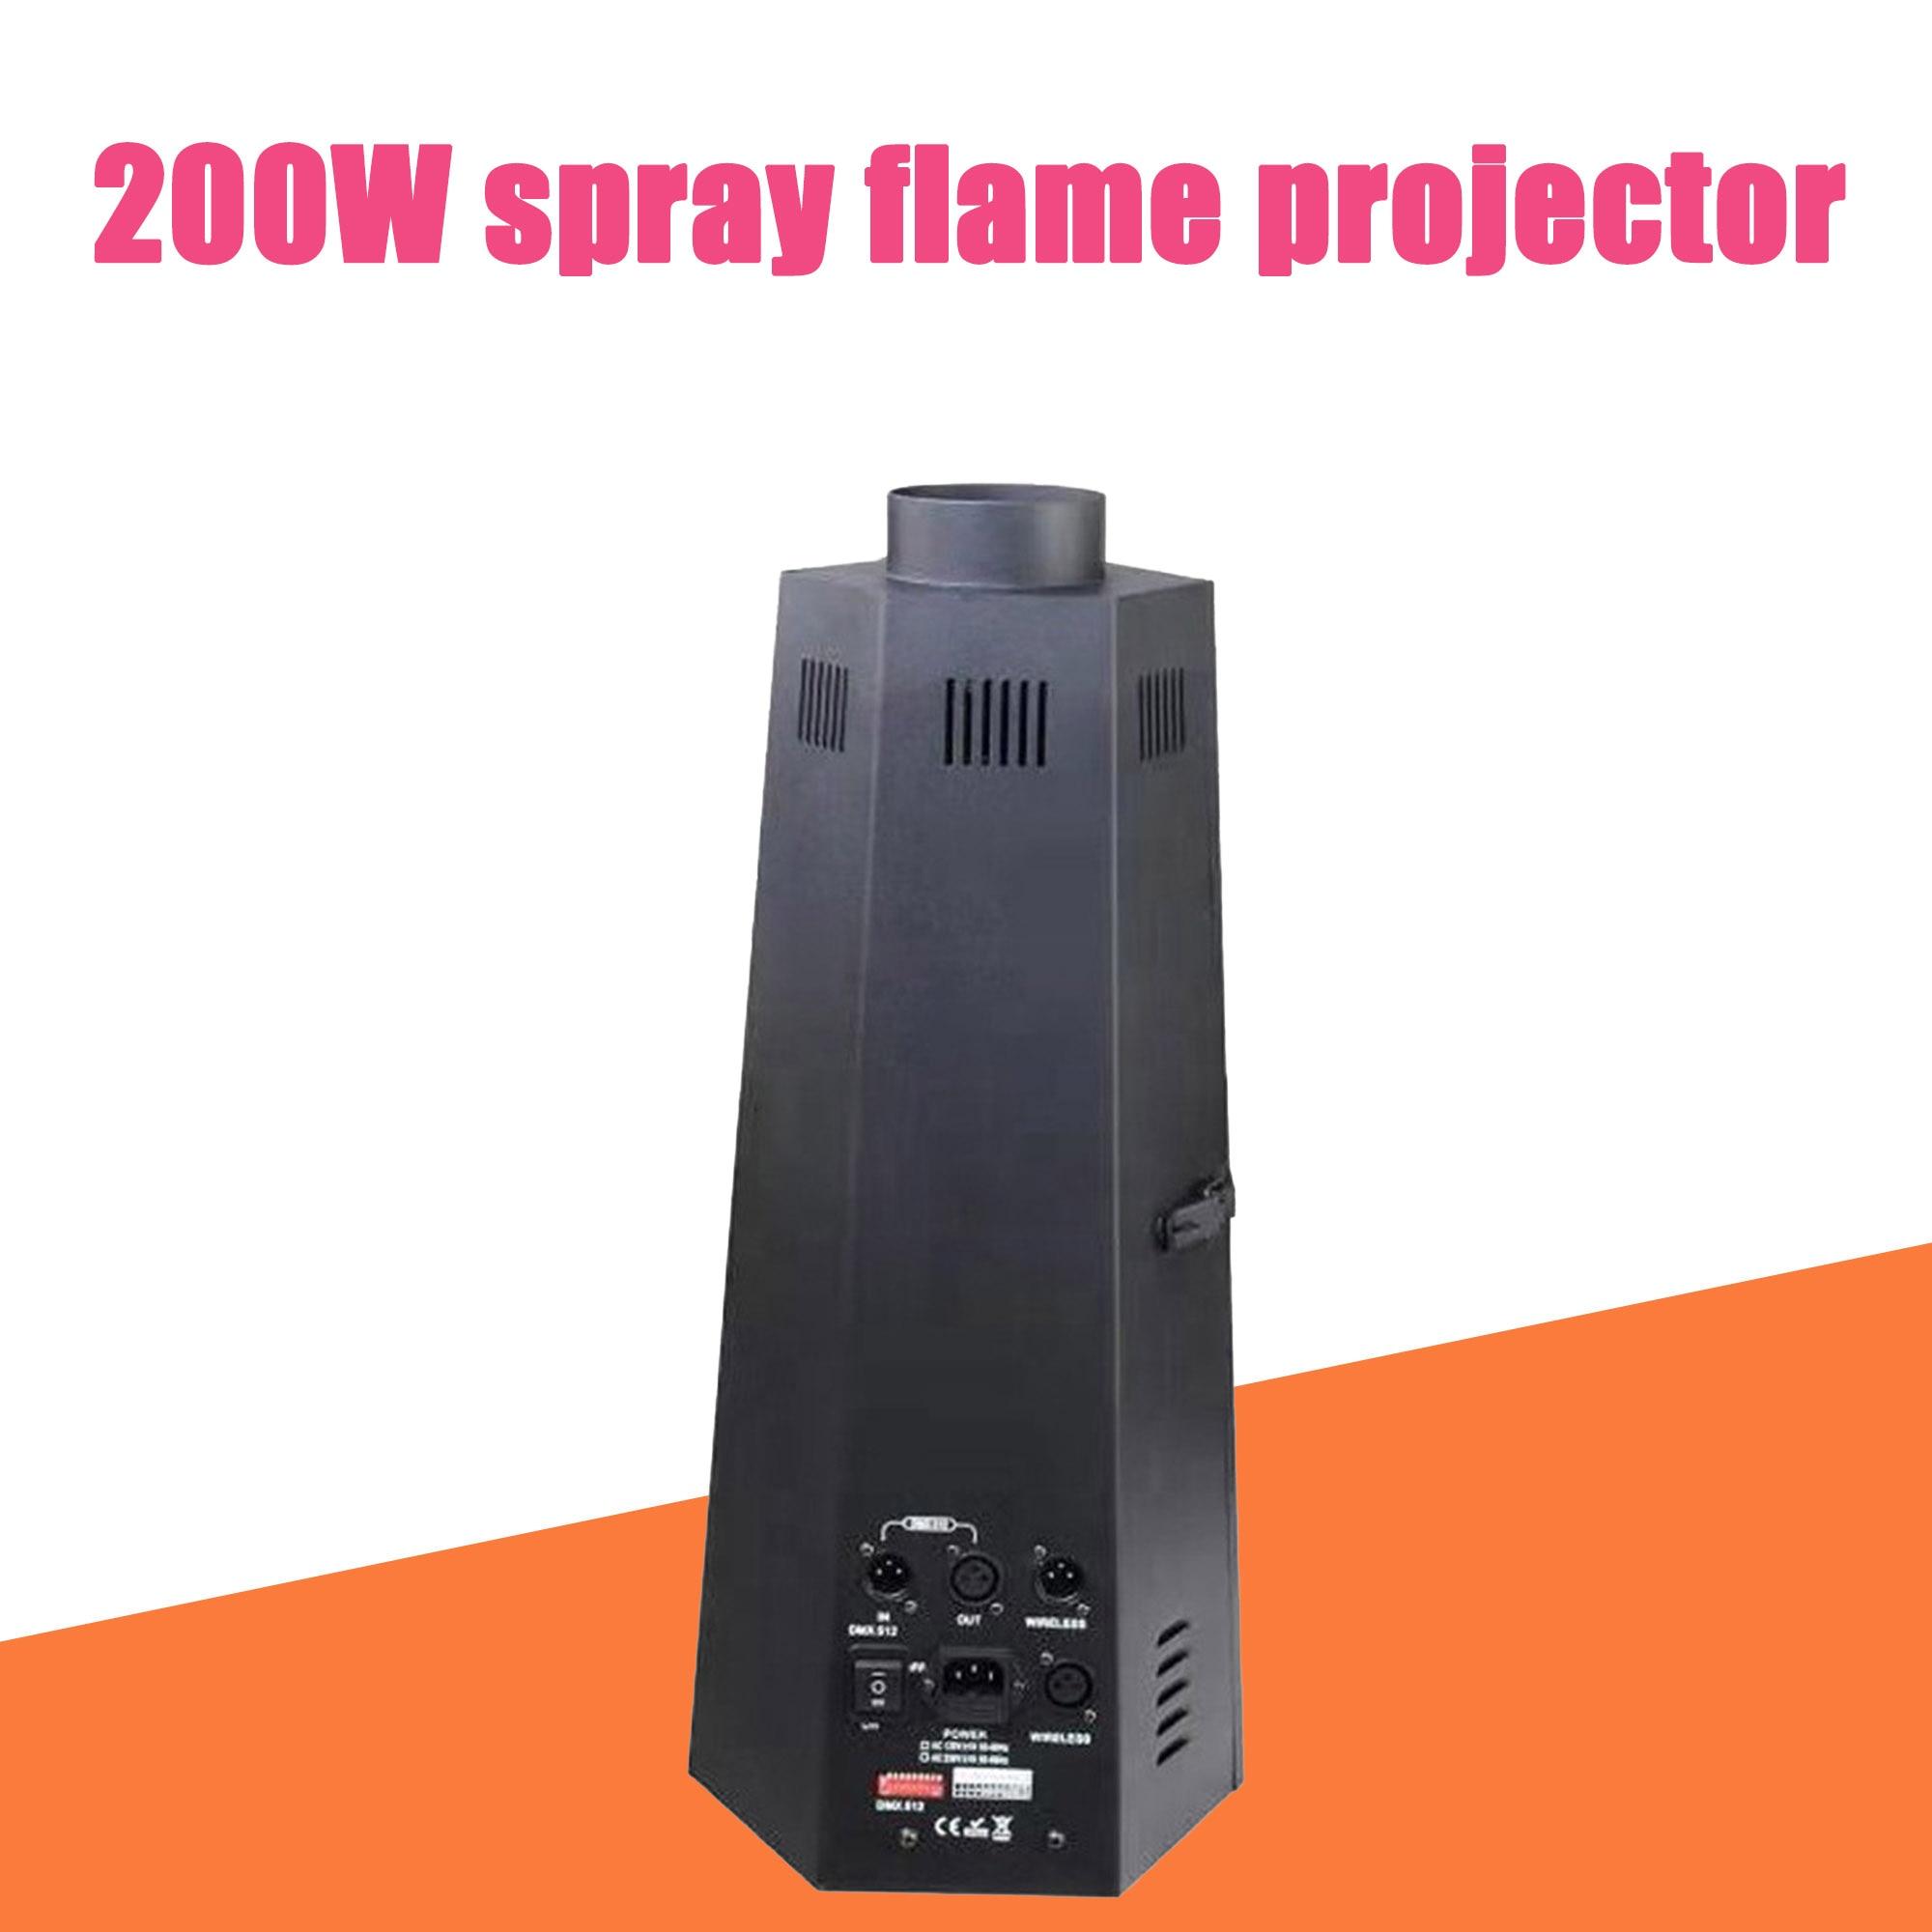 DMX 200W تأثير اللهب ، جهاز عرض المسرح ، حفلة